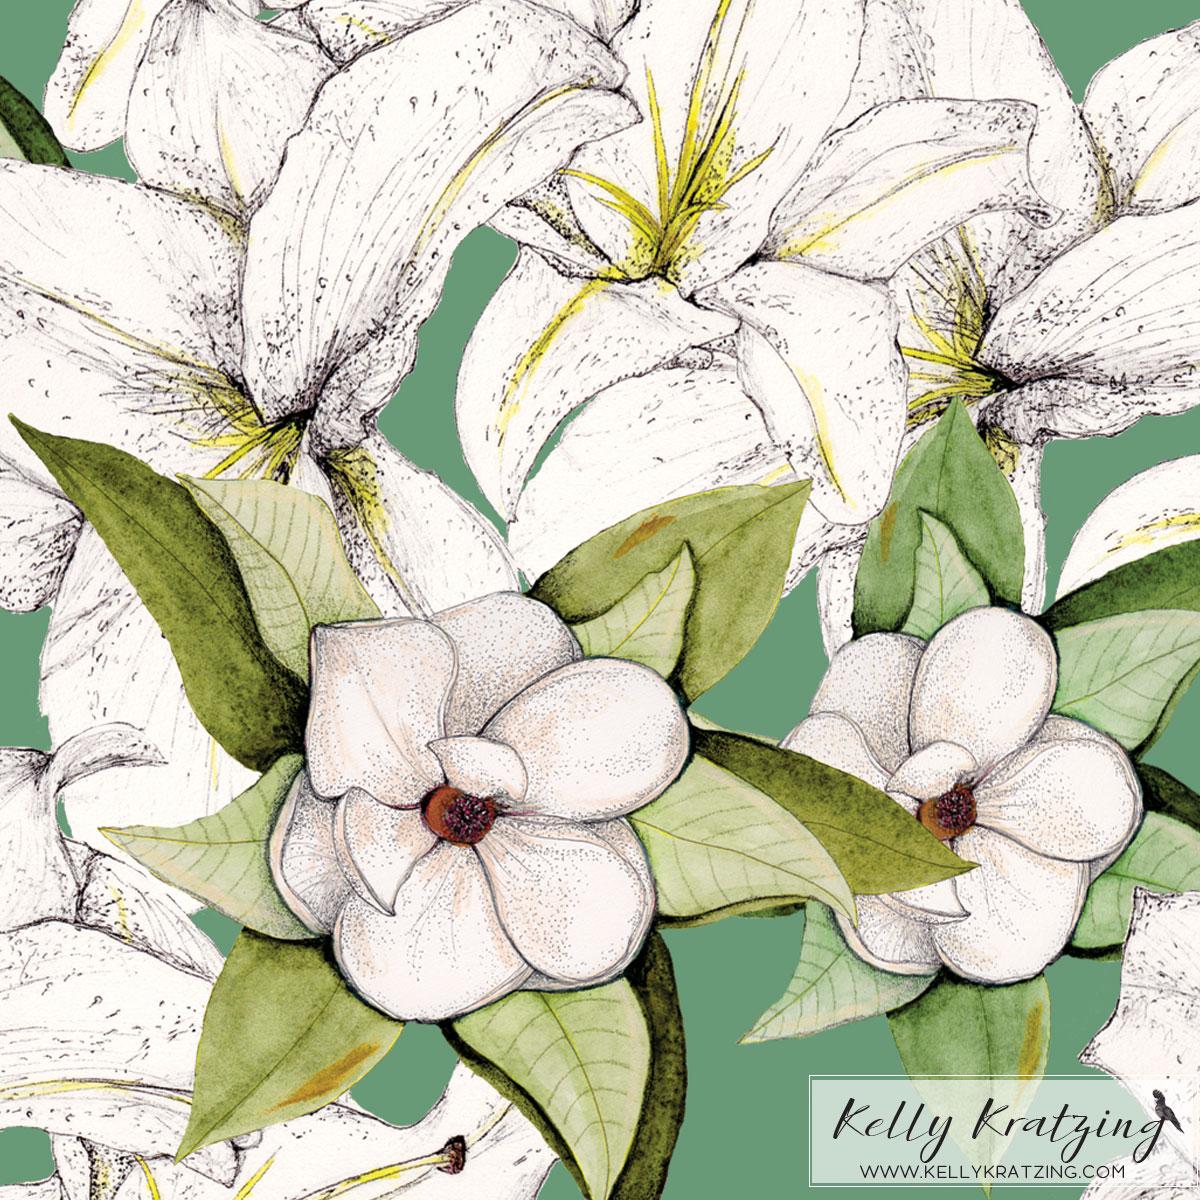 KELLY_KRATZING_SWEET-LILLIES_4